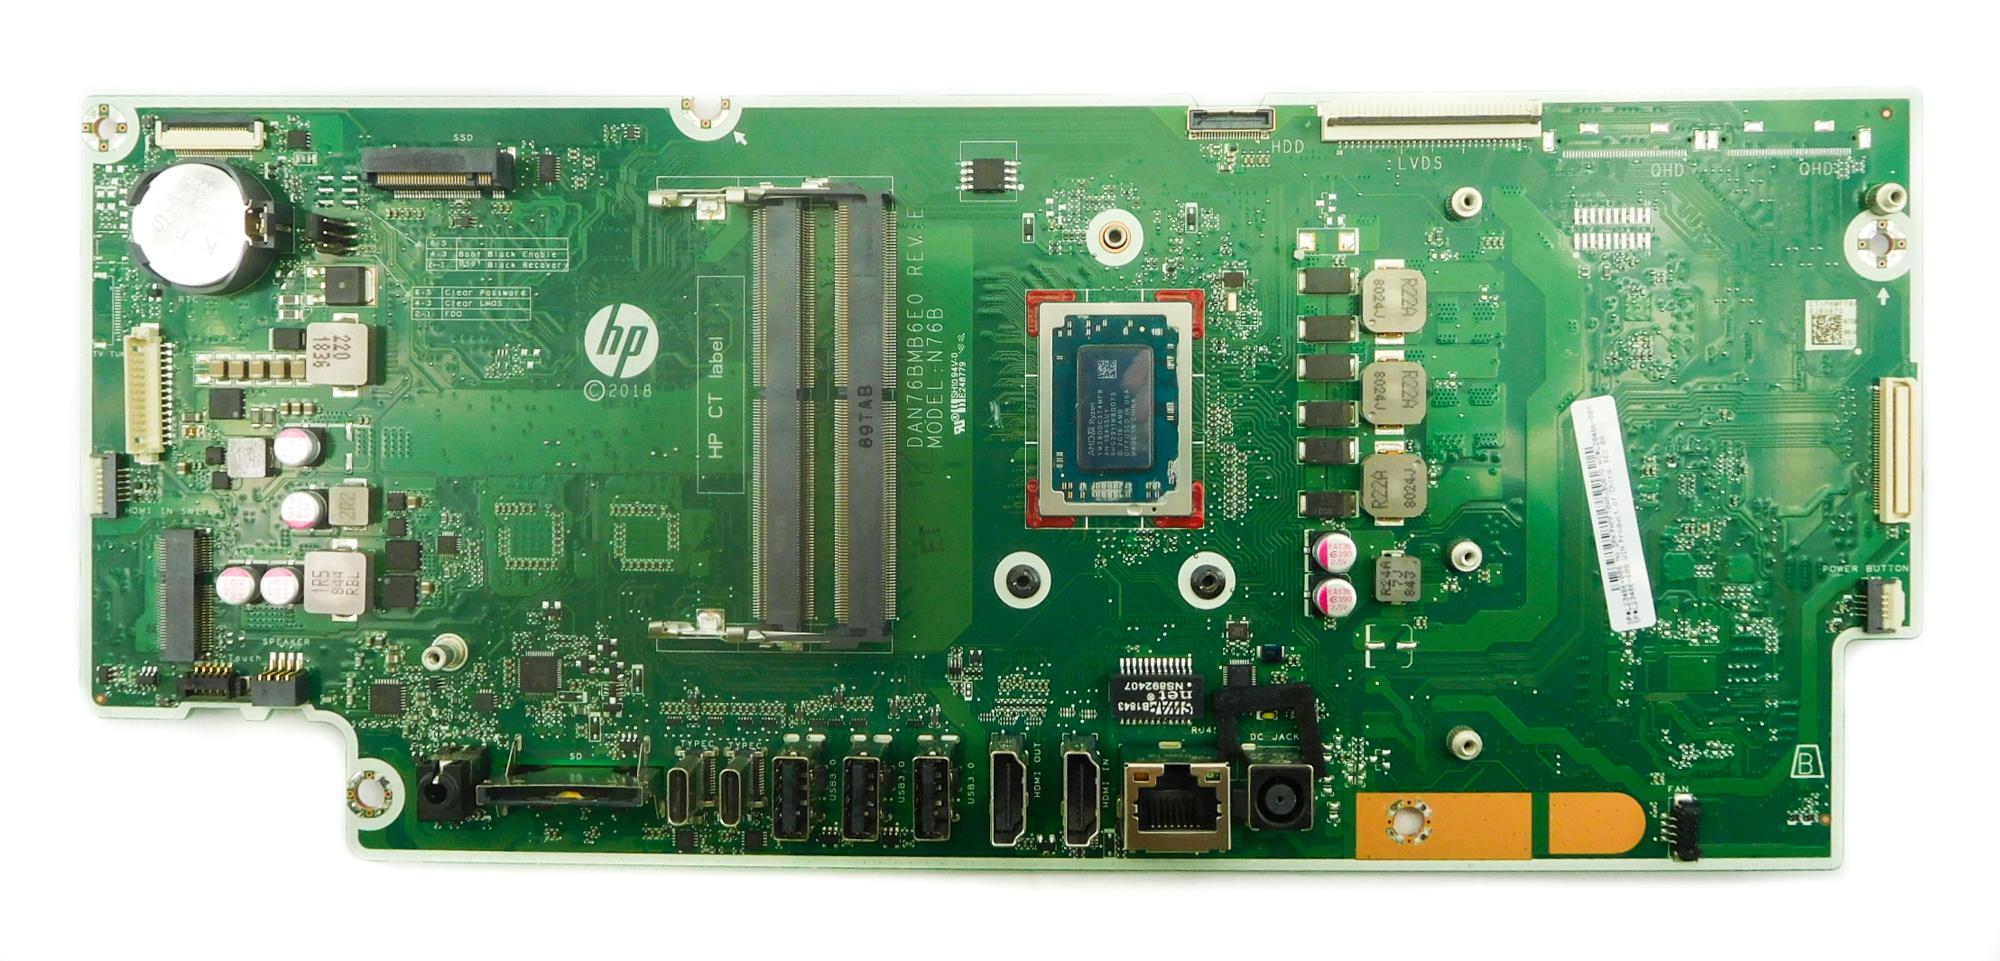 HP L20486-008 Pavilion 24-xa000 AIO PC Motherboard w/ BGA AMD Ryzen 7 2800H